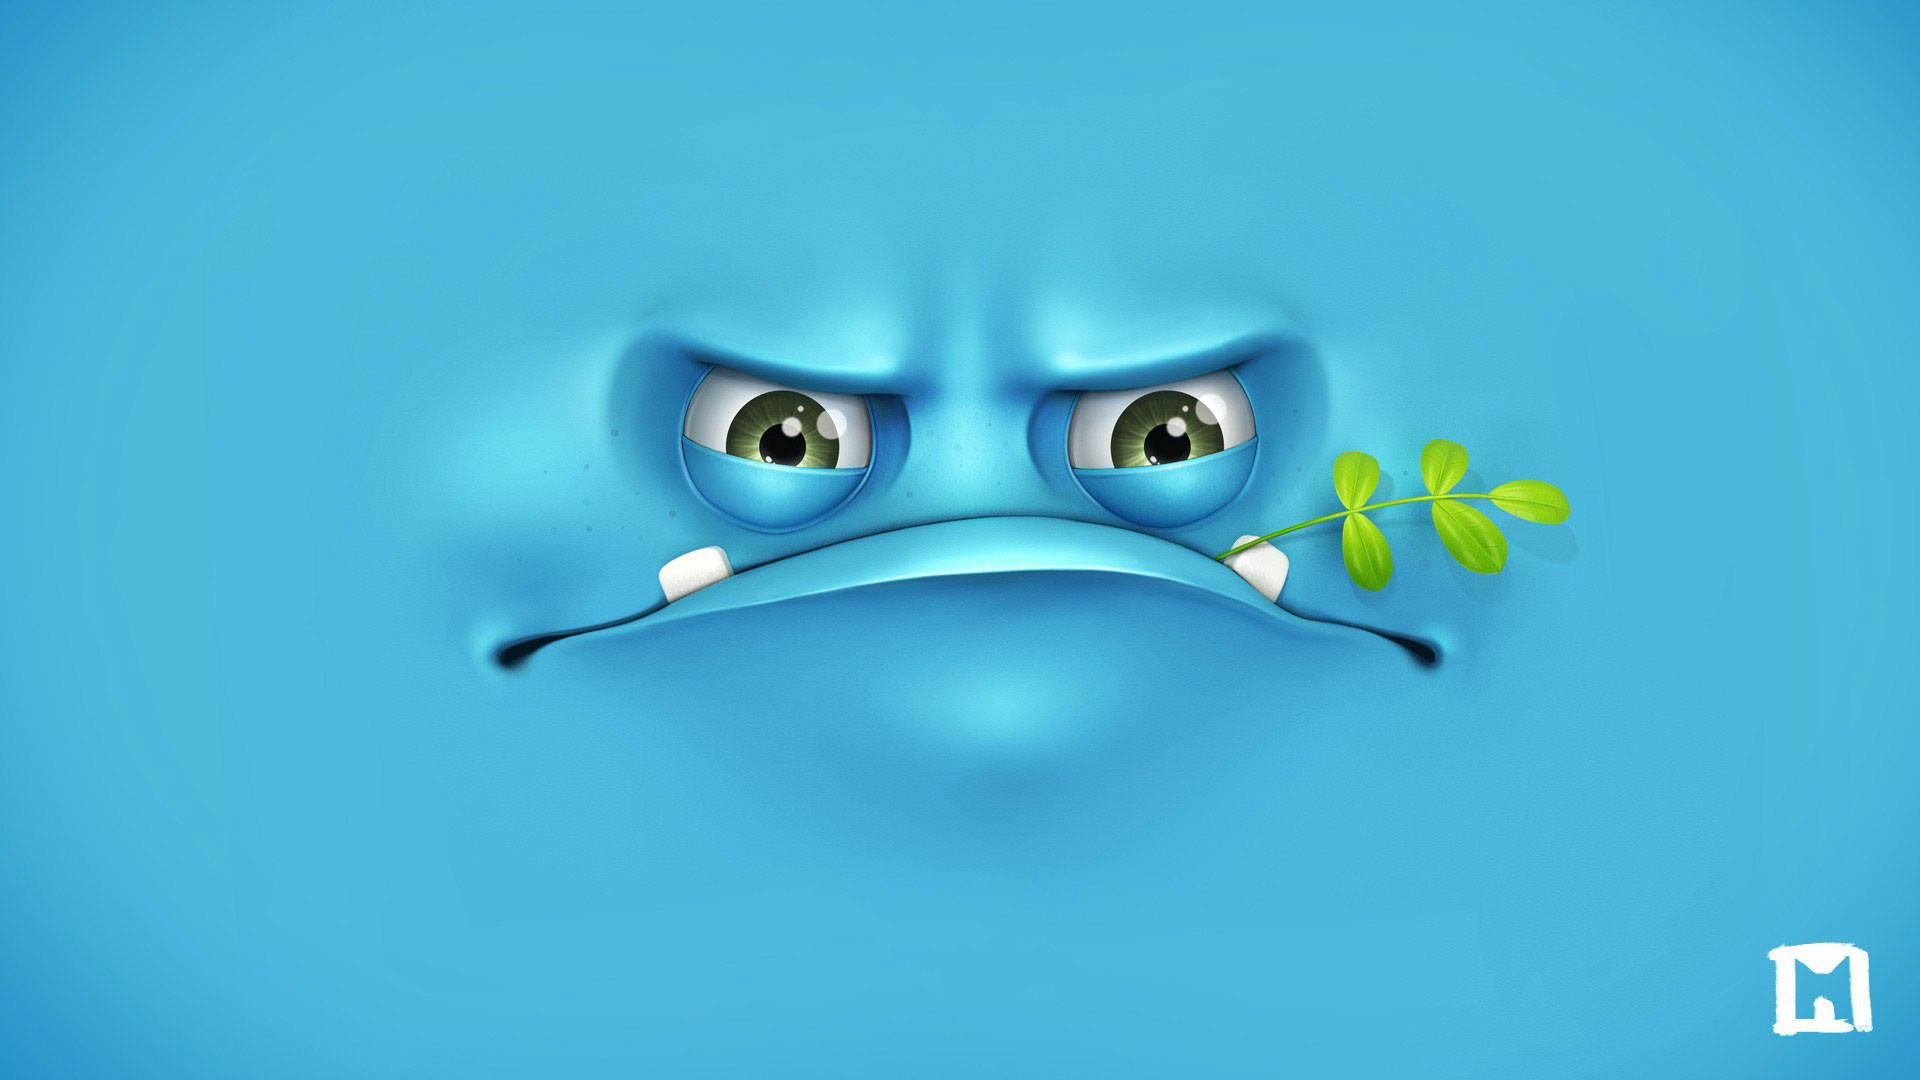 Cute Cartoon Hd Wallpapers For Iphone 6 Vinny Oleo Vegetal Info